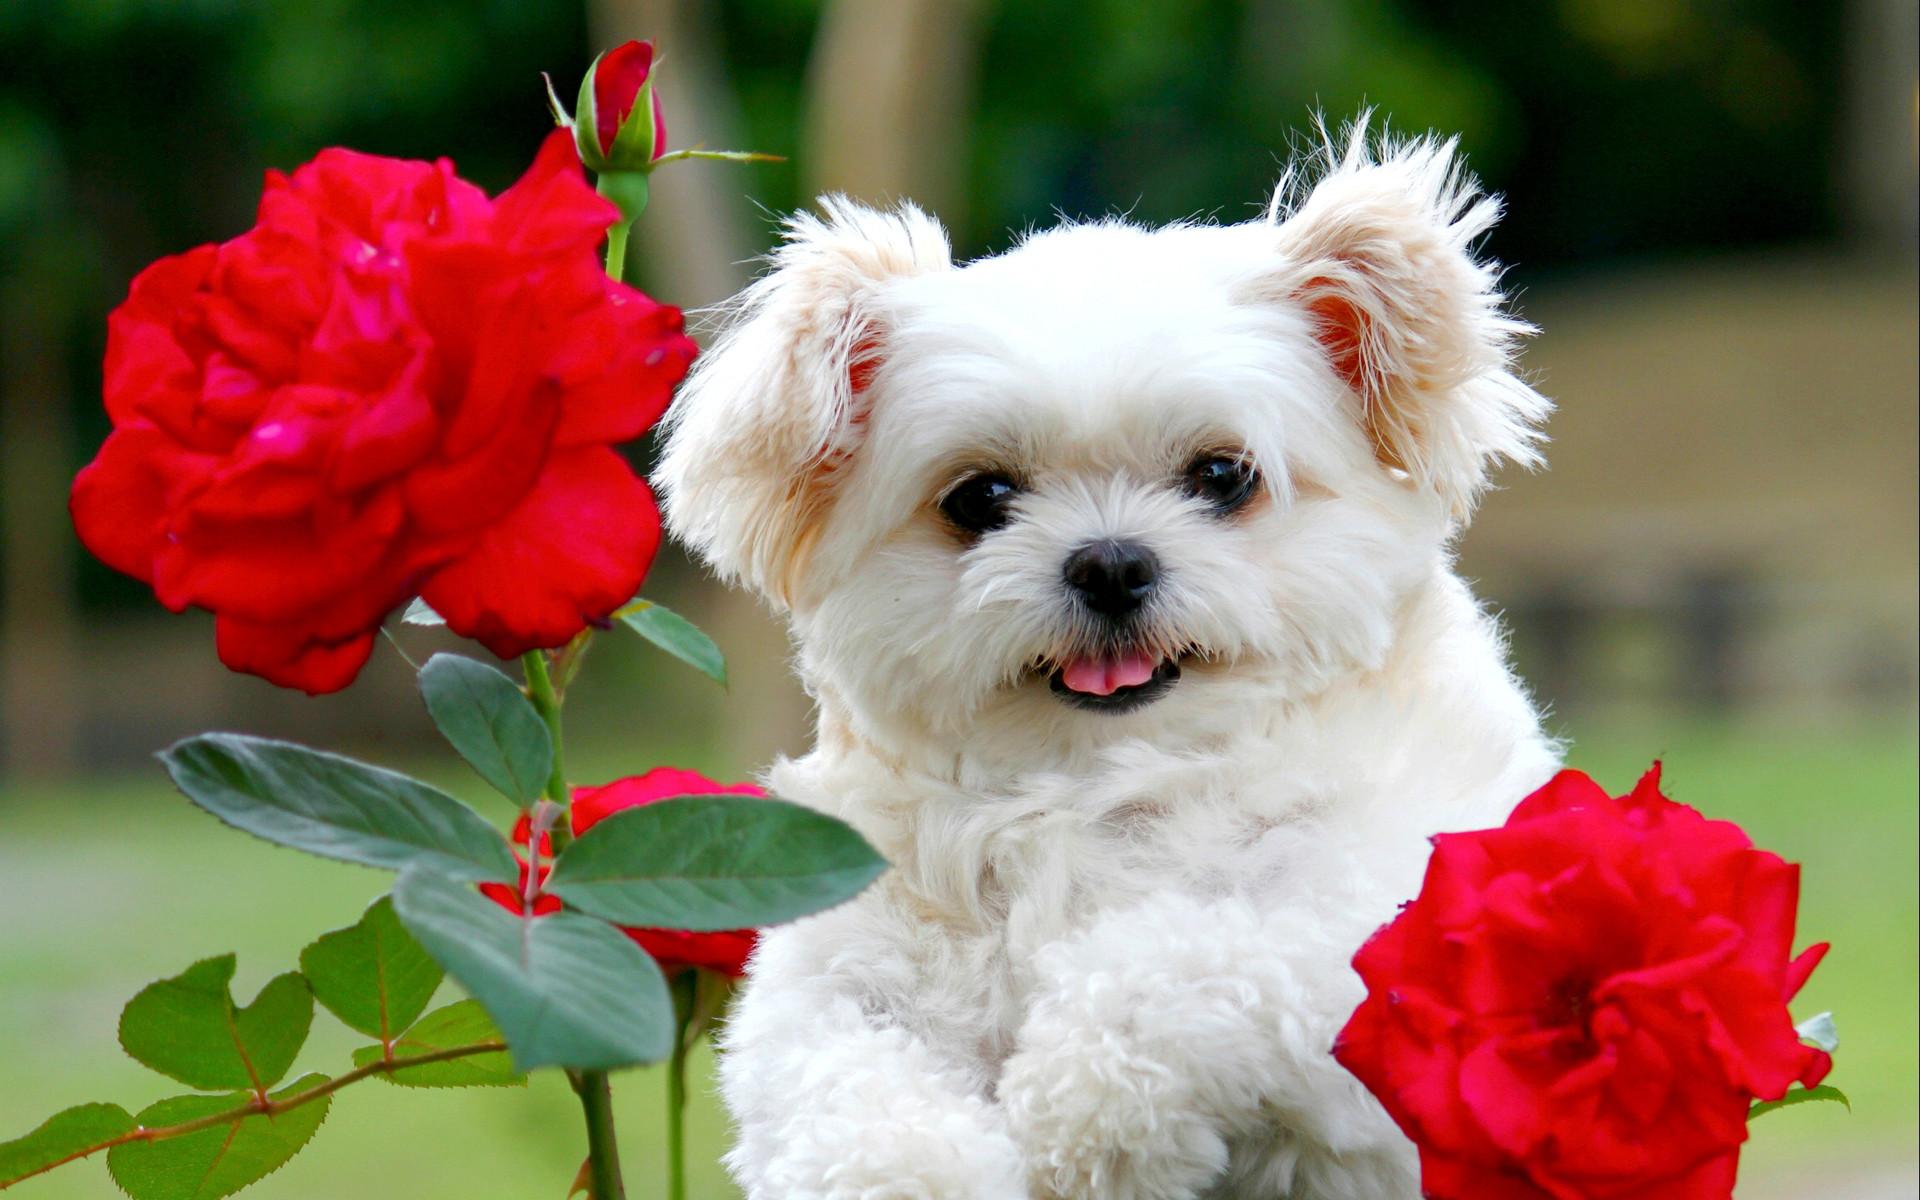 Yorkie Garden Statue Cute Puppy Backgrounds 1280x800 Wallpaper Teahub Io